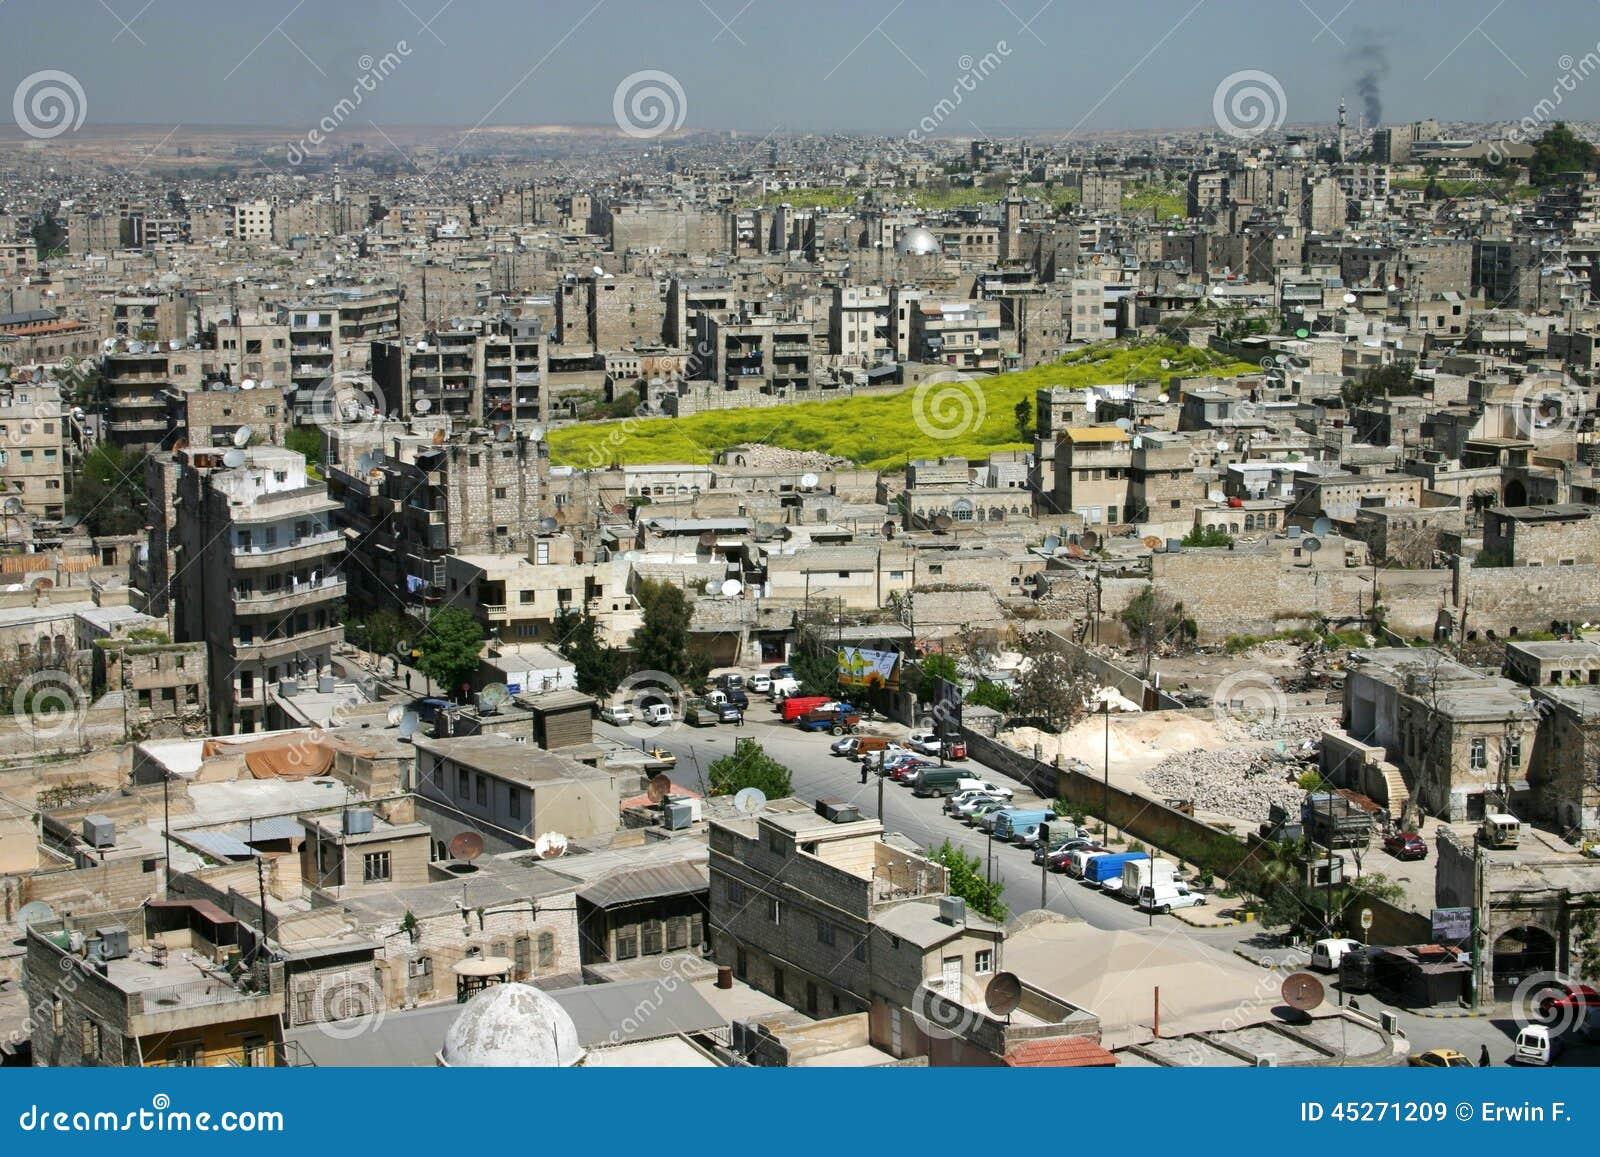 Aleppo - Syria Stock Photo - Image: 45271209